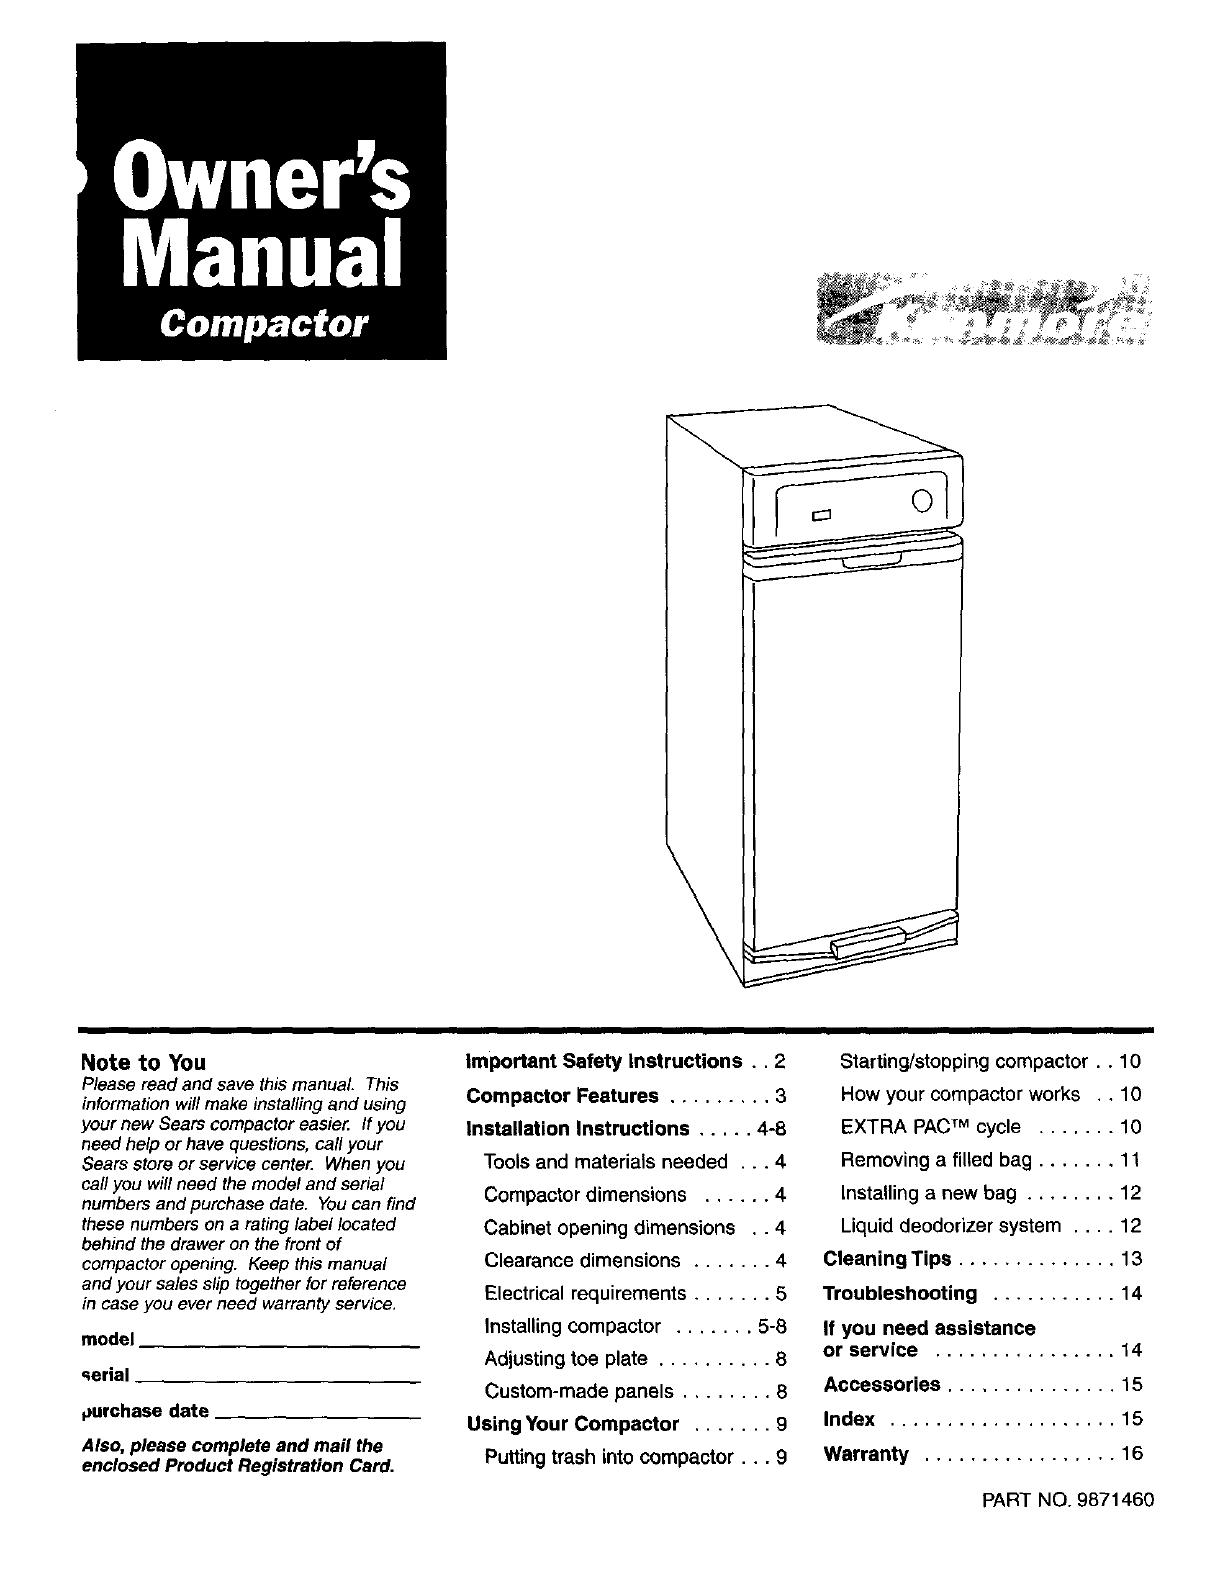 Kenmore 66513601790 User Manual COMPACTOR Manuals And Guides L0407345UserManual.wiki